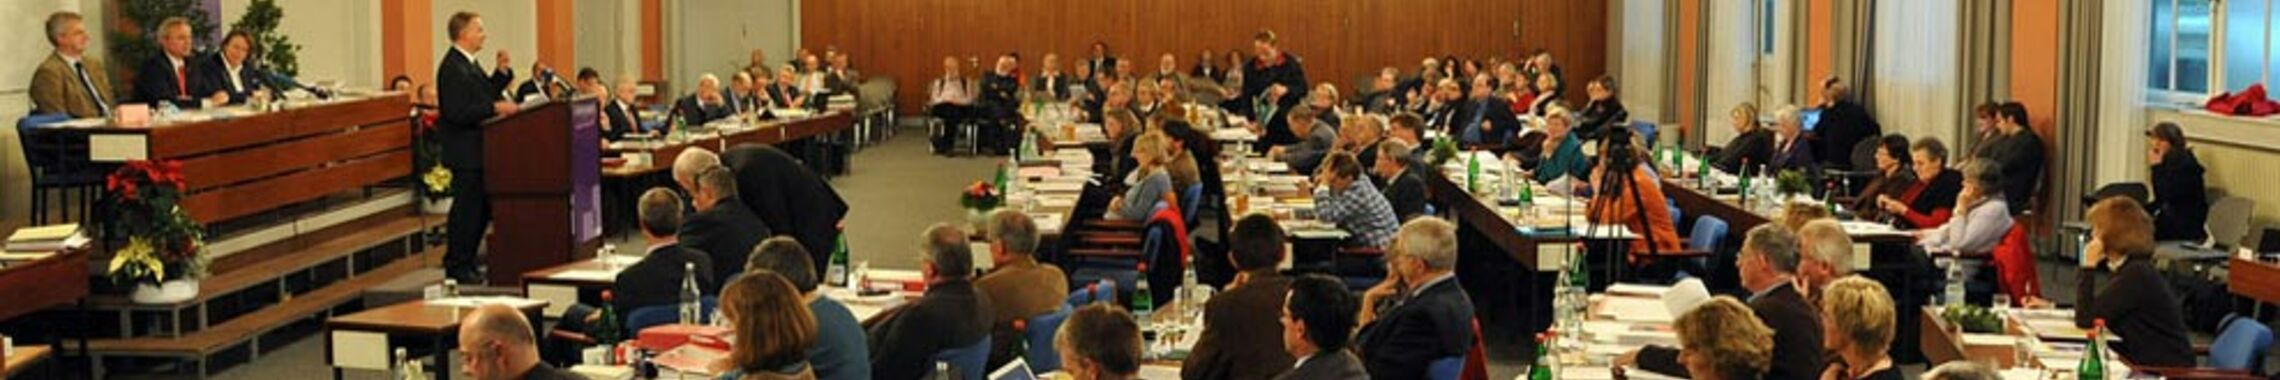 Kopfbild Synode